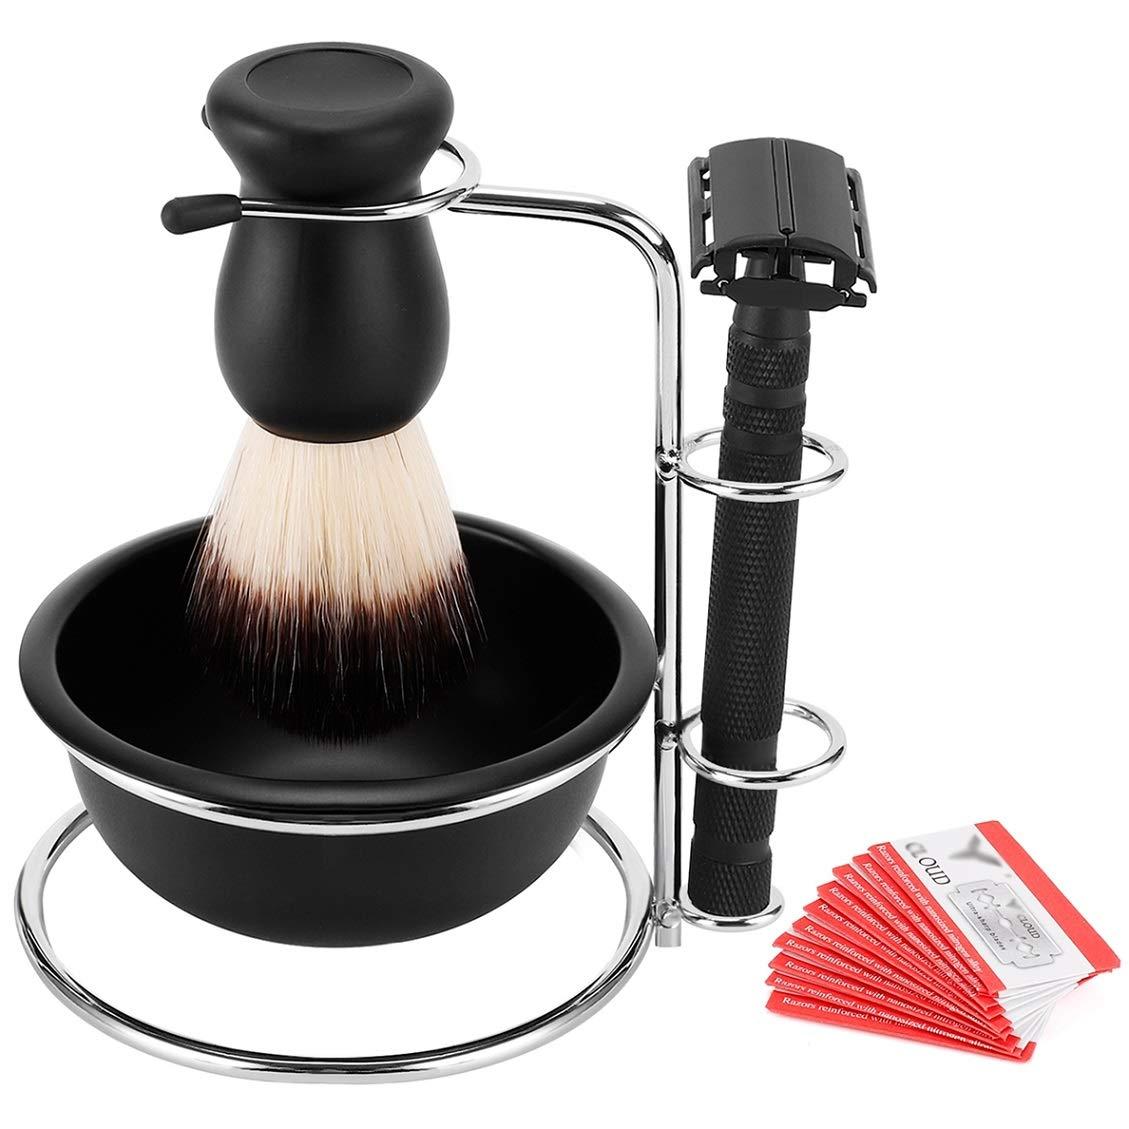 SANWA Men's Wet Shaving Kit - Universal Shaving Stand,Friendly Brush,Shaving Soap Bowl Mug for Cream,Safety Razor with 10 blades,Nice Gift for Dad, boyfriend, Husband,Father's Day